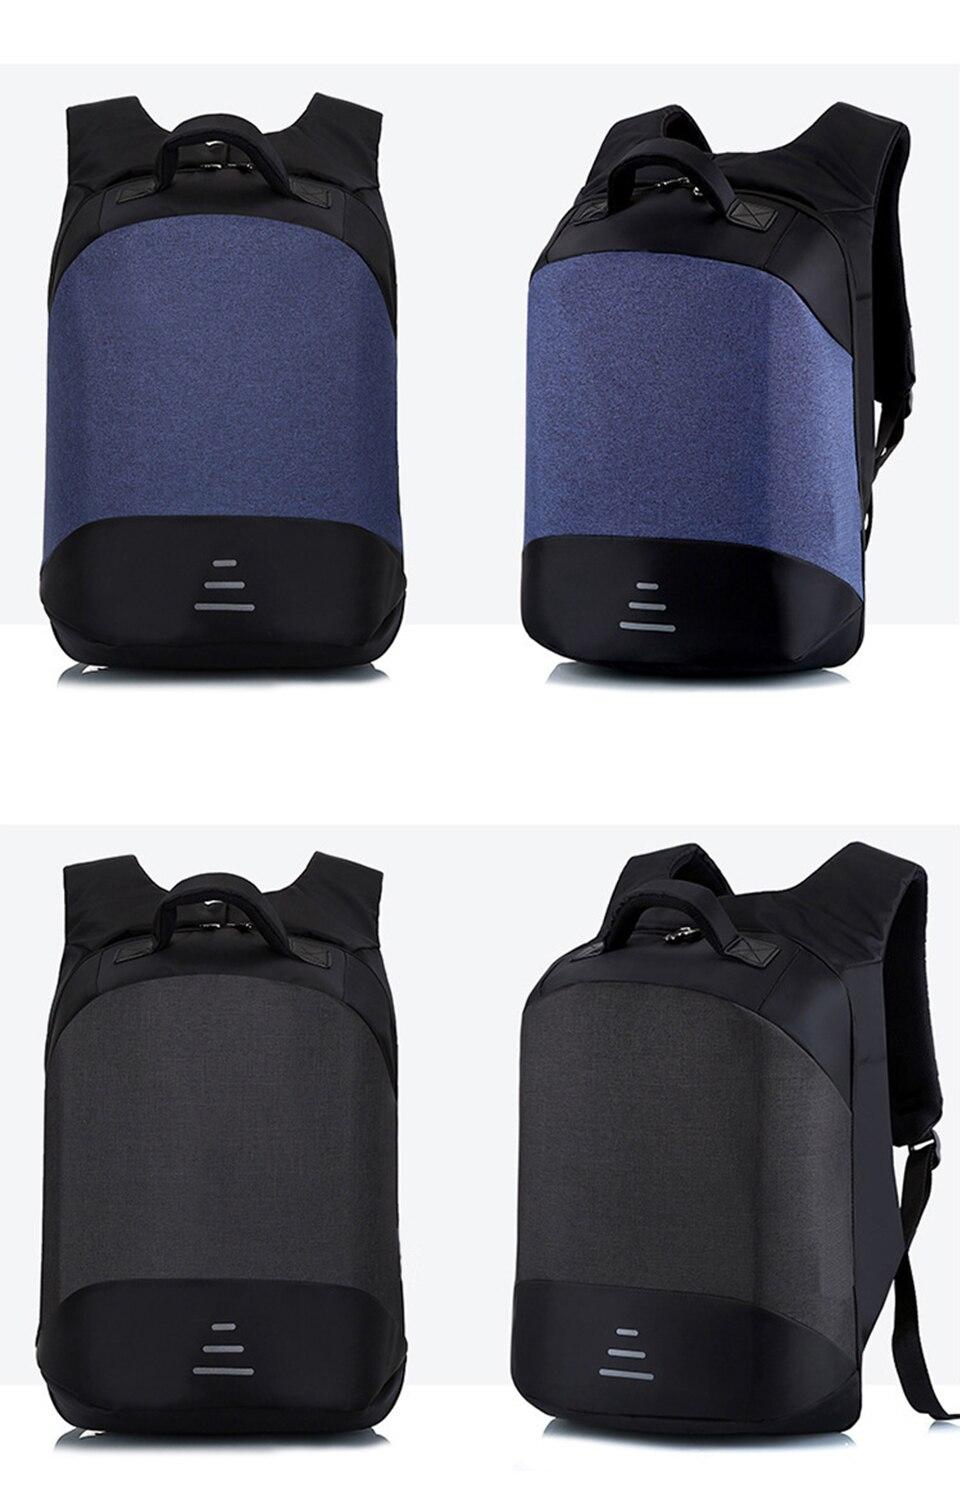 17''-Anti-theft-Backpack-Bag-Mens-Women-Male-Mochila-Outdoor-Travel-Bags-15.6-Inch-Laptop-Backpacks-USB-Charging-Backpacking-Men_10